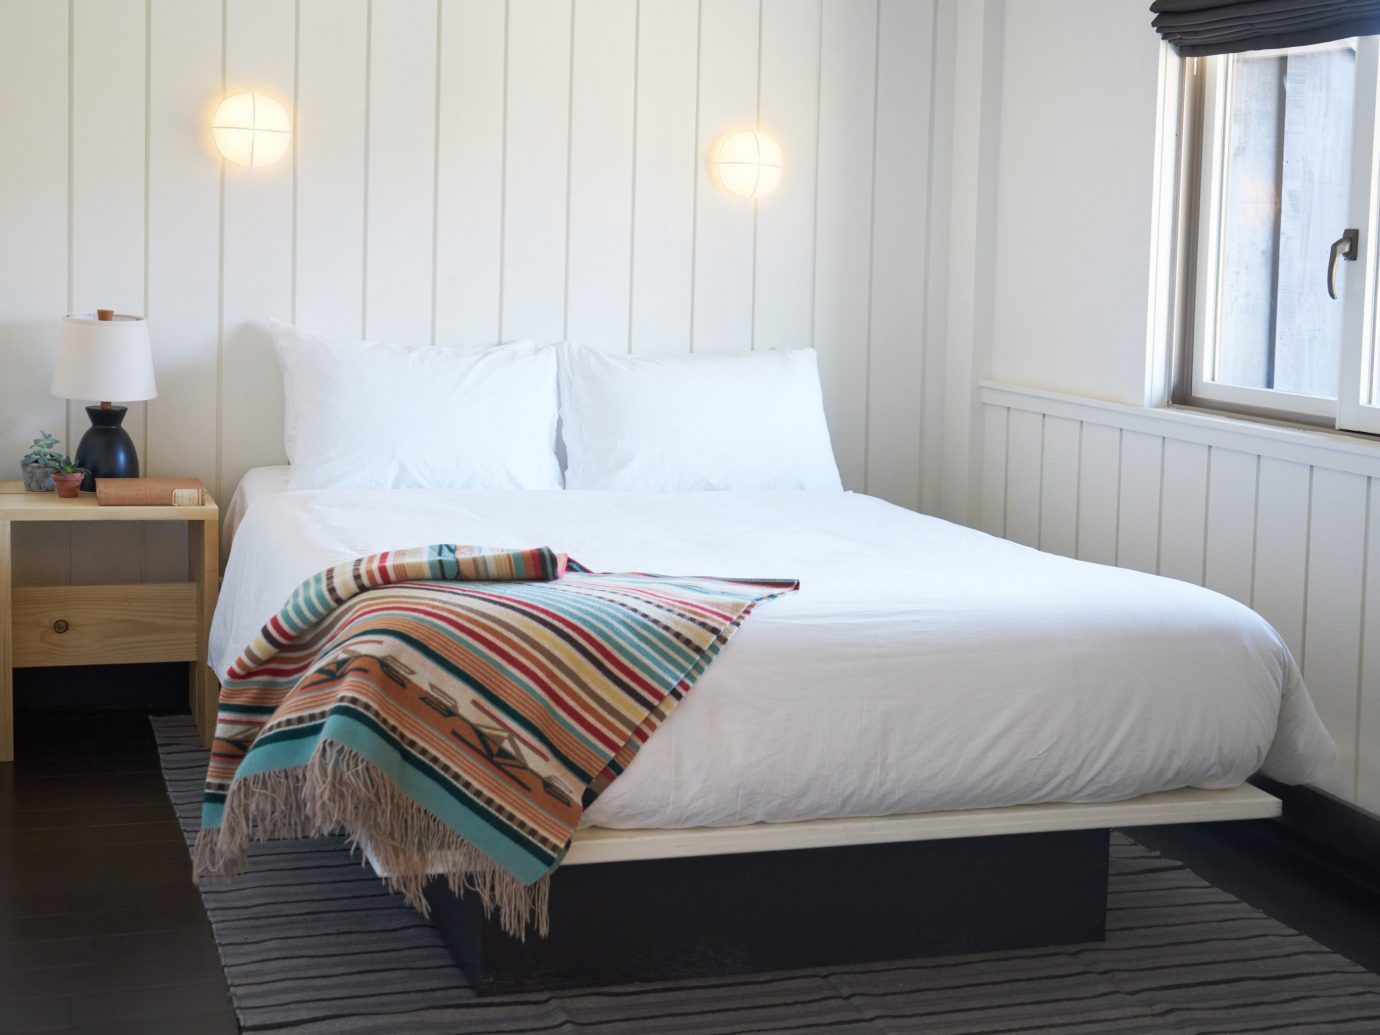 Romance Trip Ideas Weekend Getaways bed wall indoor floor room Bedroom property hotel furniture Suite cottage interior design bed frame bed sheet real estate apartment lamp